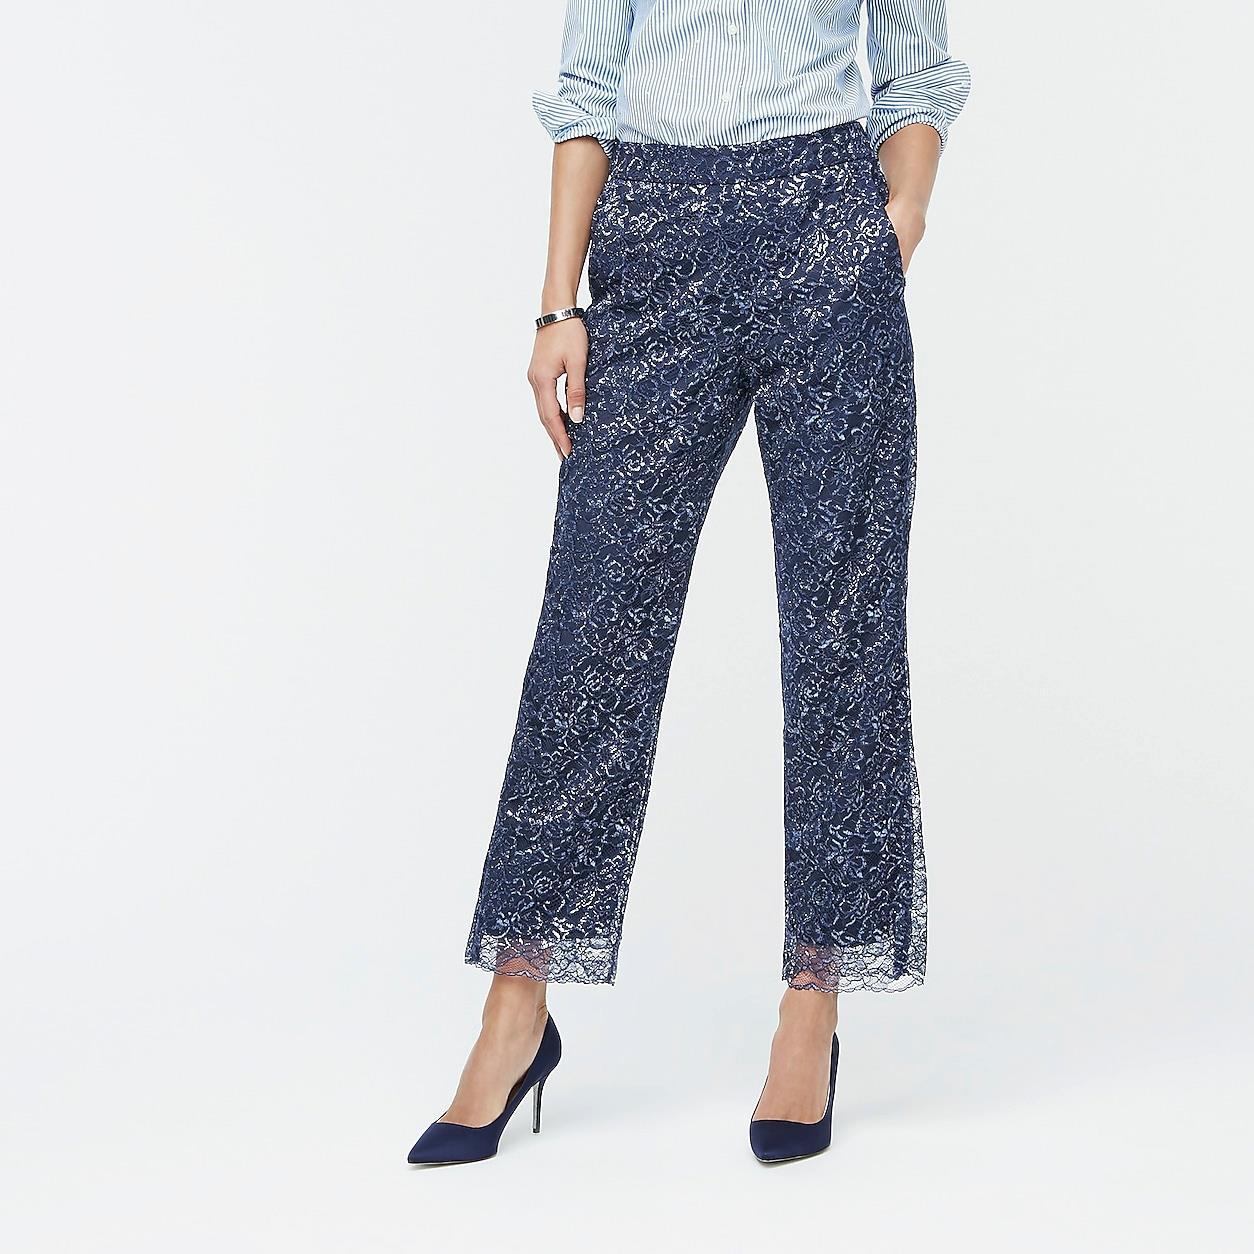 High-Rise Pull-On Peyton Wide-Leg Pant In Metallic Lace